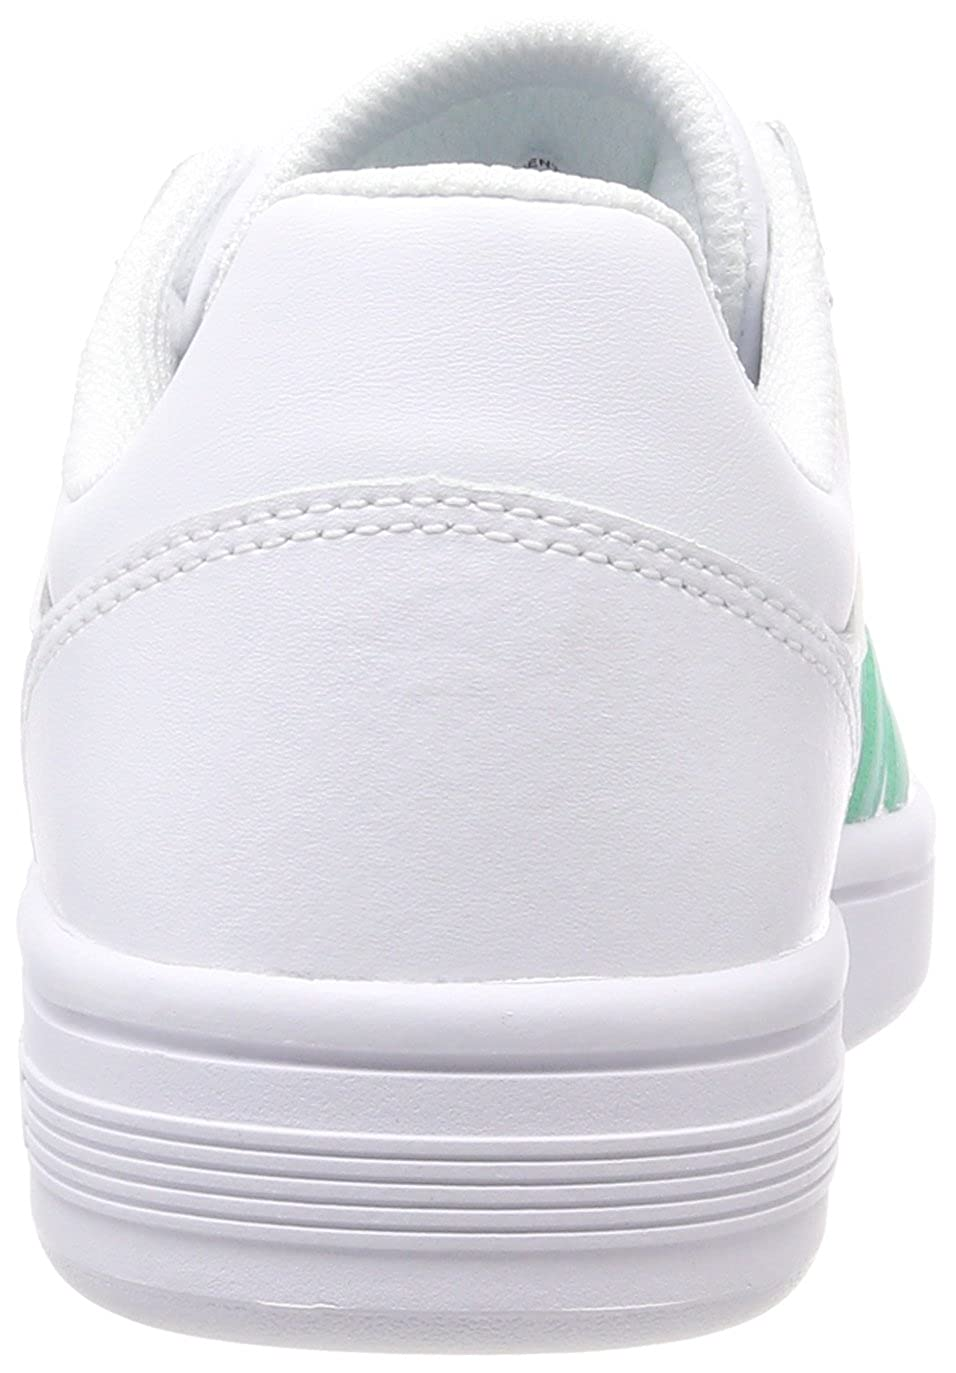 K-Swiss Weiß Damen Court Cheswick Sneaker Weiß K-Swiss (Weiß/Bermuda 173) 010fae